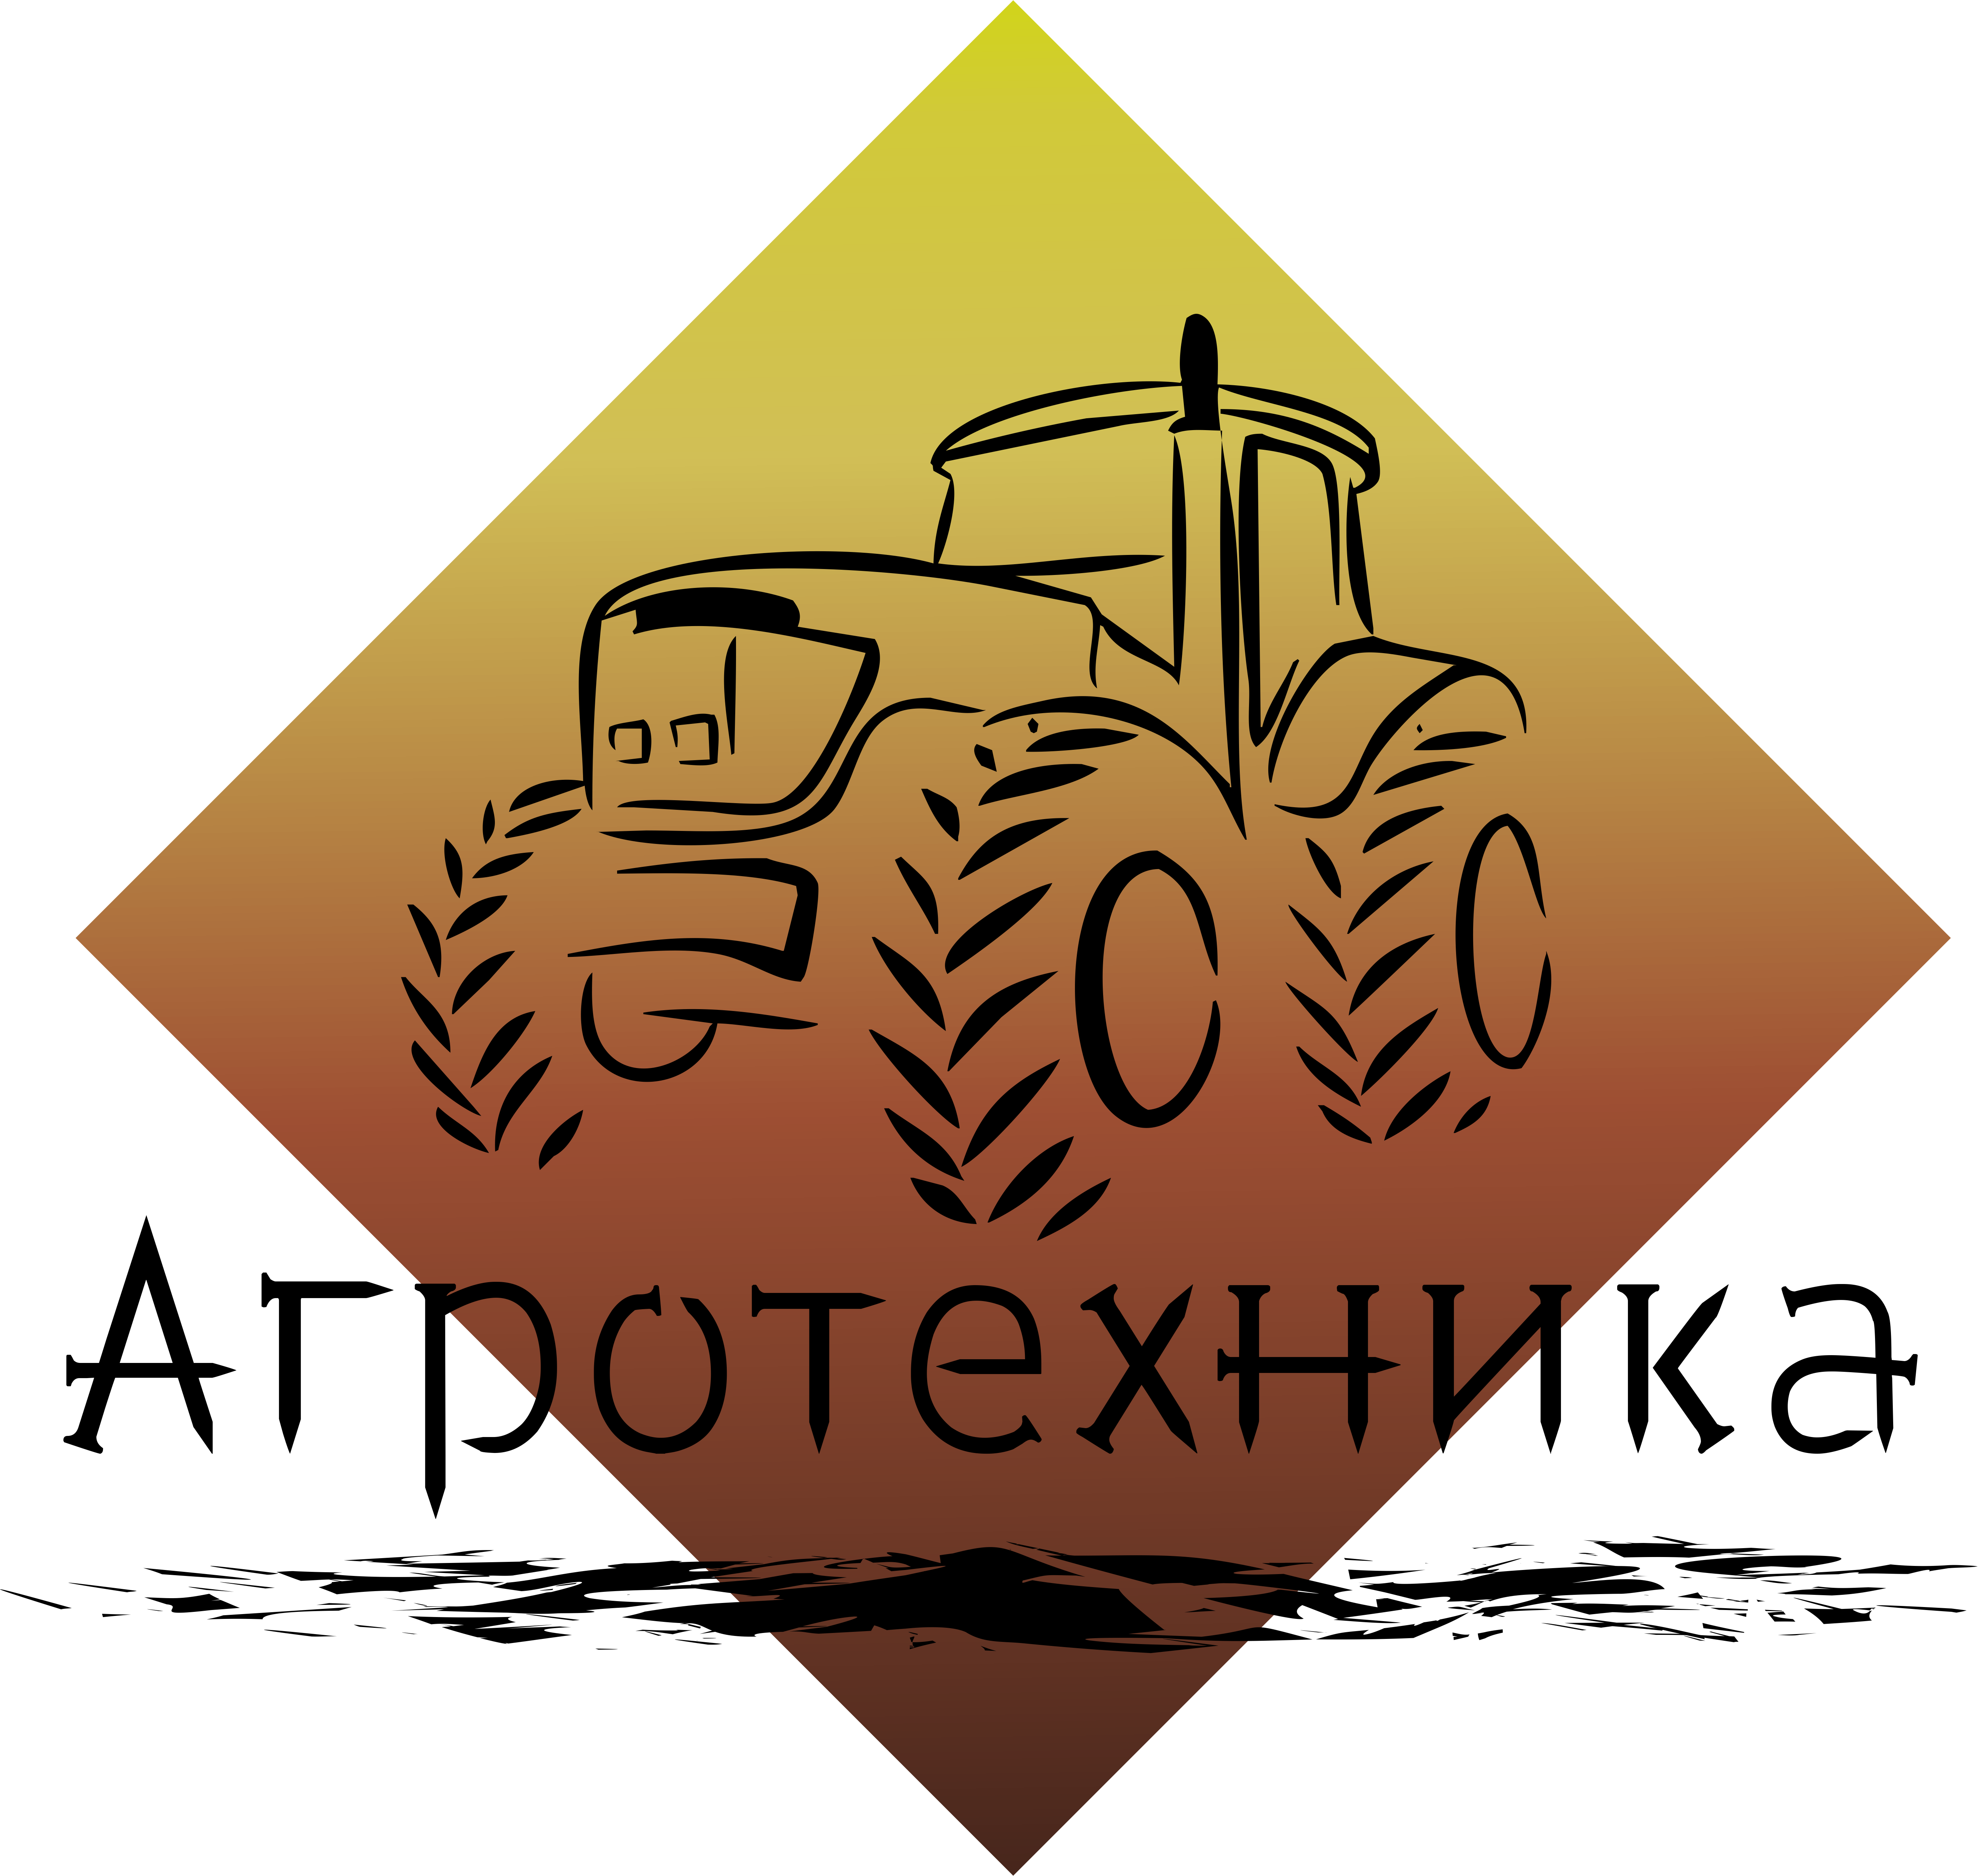 Разработка логотипа для компании Агротехника фото f_2475bffdb799e167.png